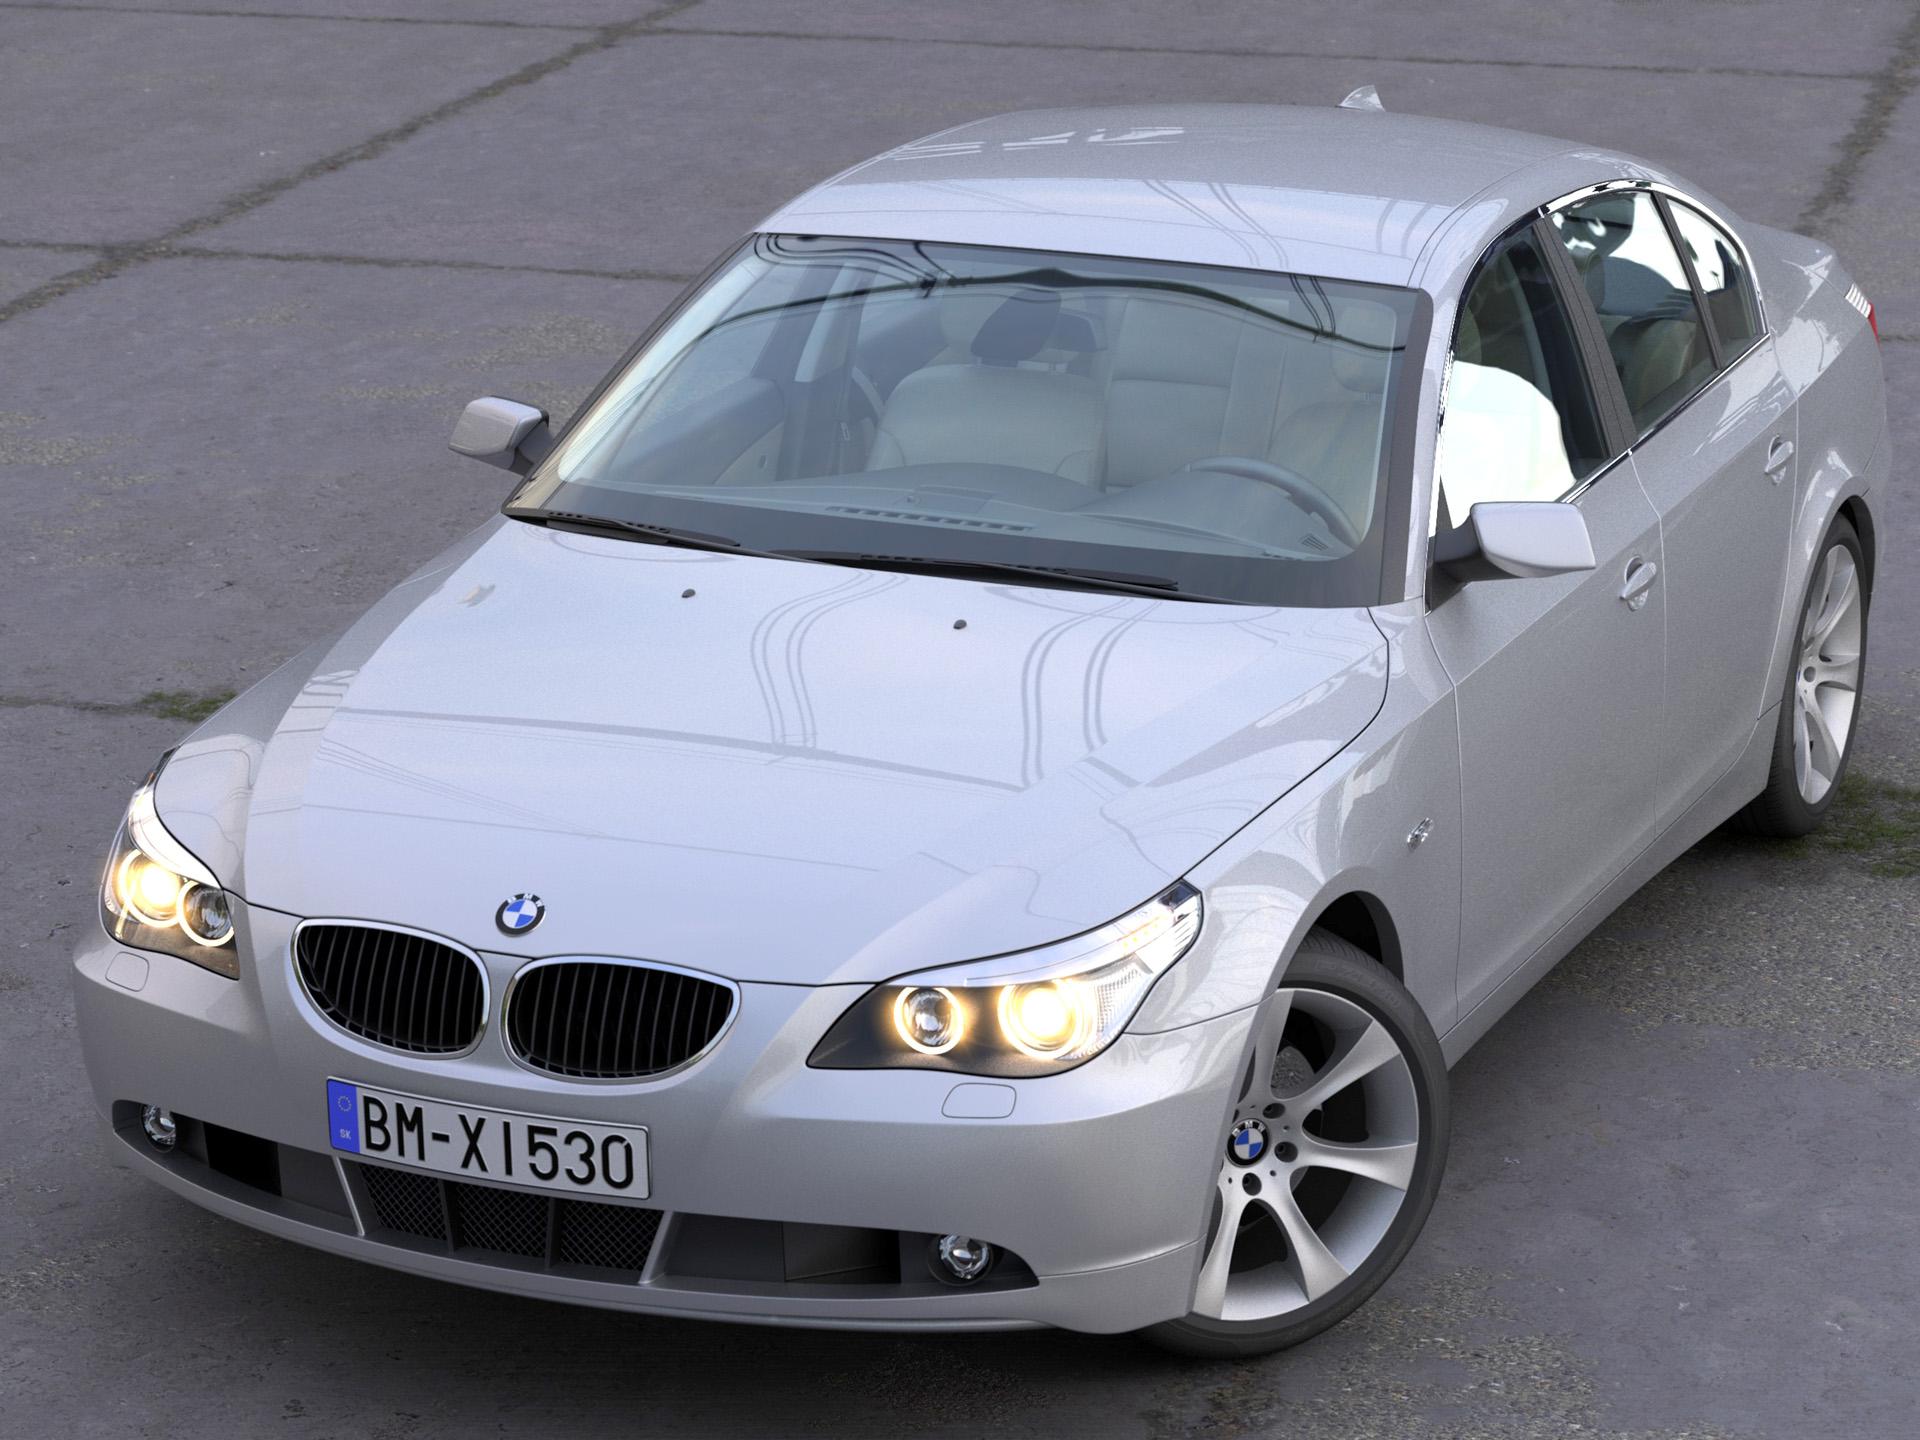 BMW 5 Series Sedan 2006 3d model 3ds max fbx c4d obj 268255